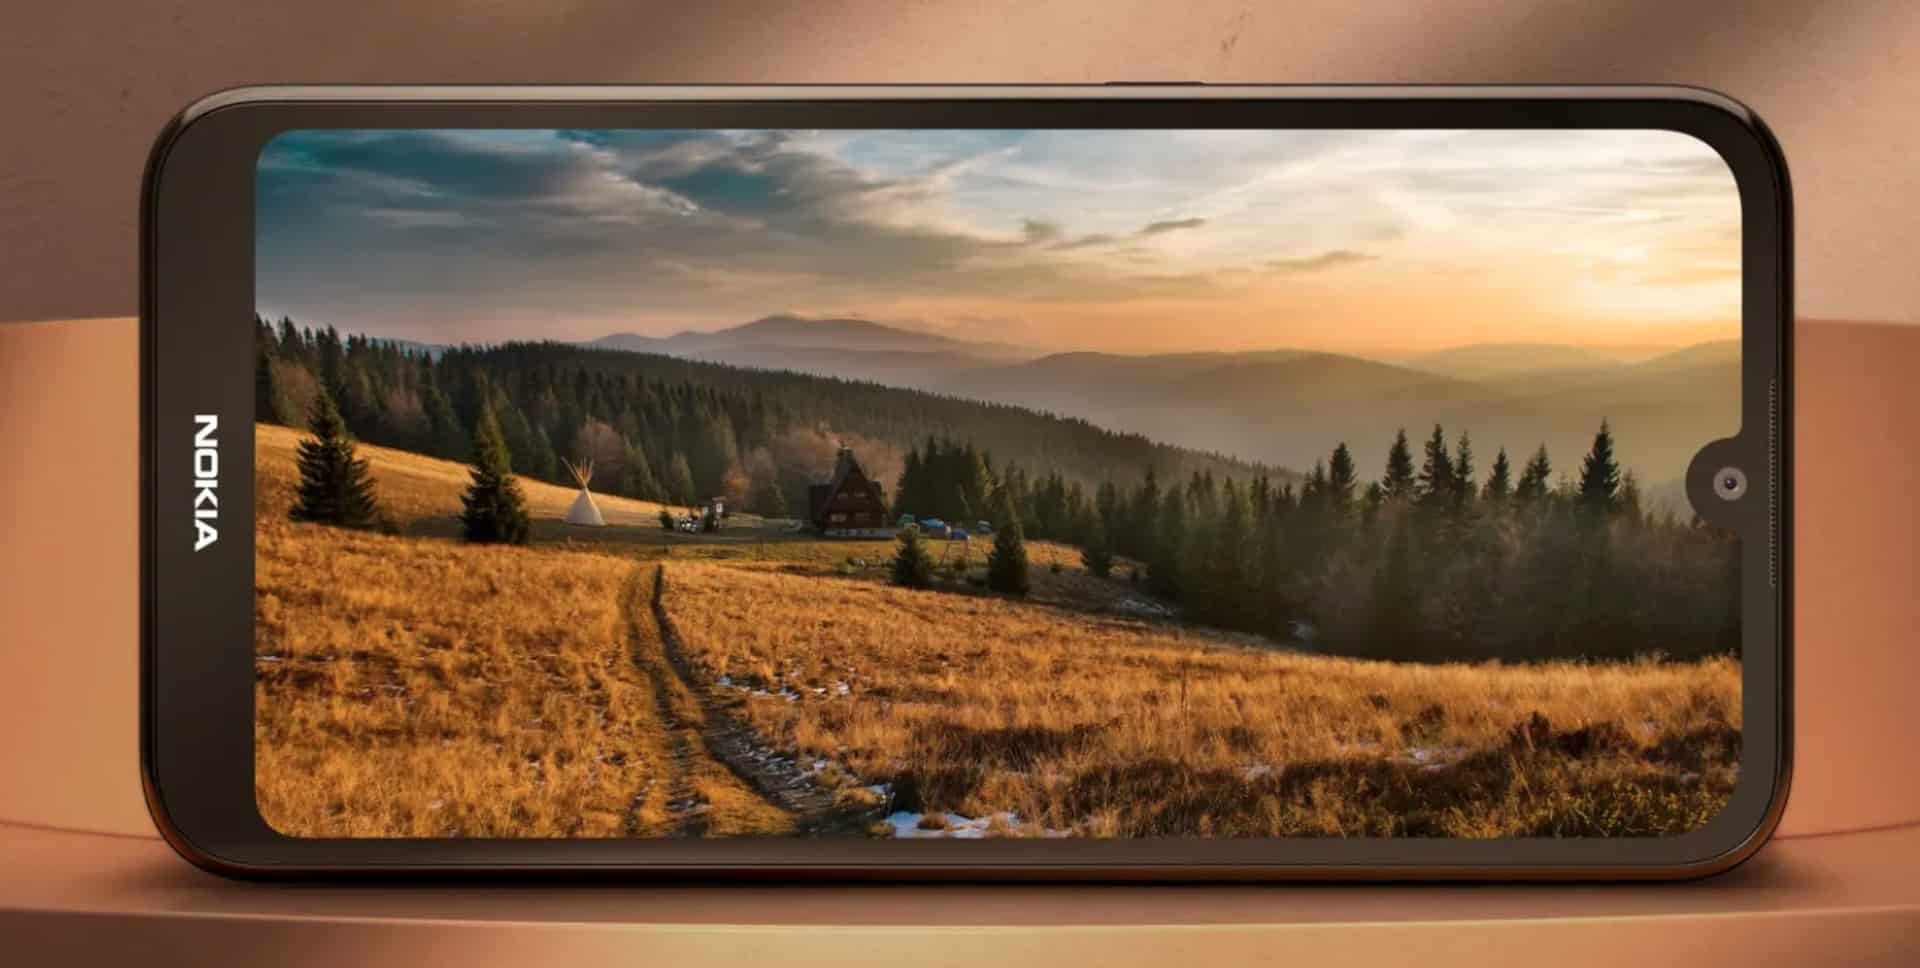 Nokia 1 3 image 1